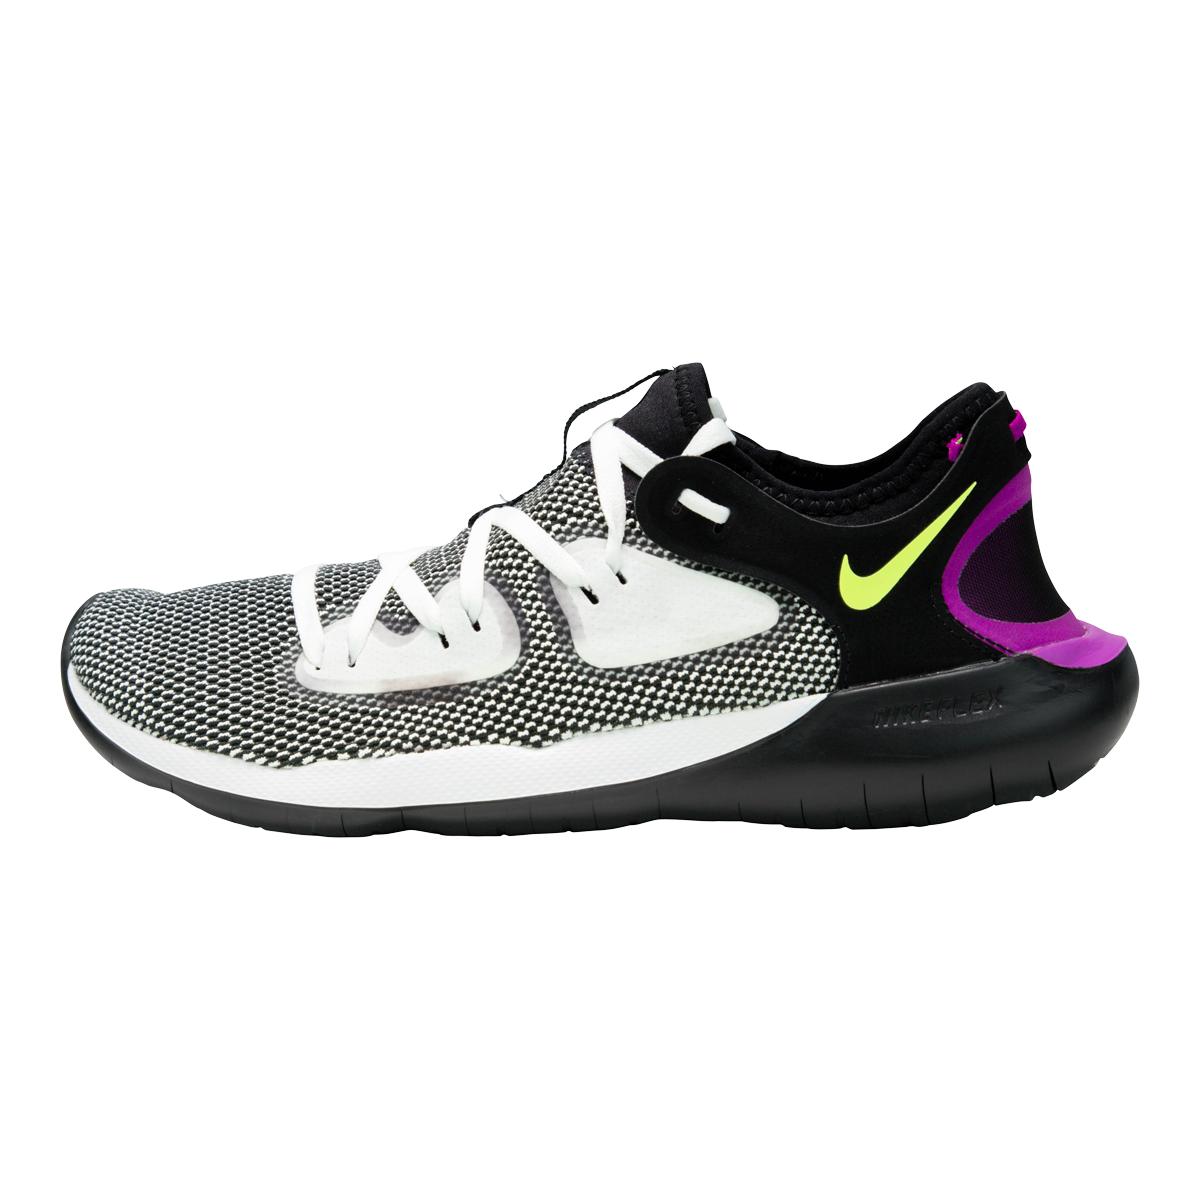 Nike-Men-039-s-Flex-RN-2019-Running-Shoes thumbnail 11